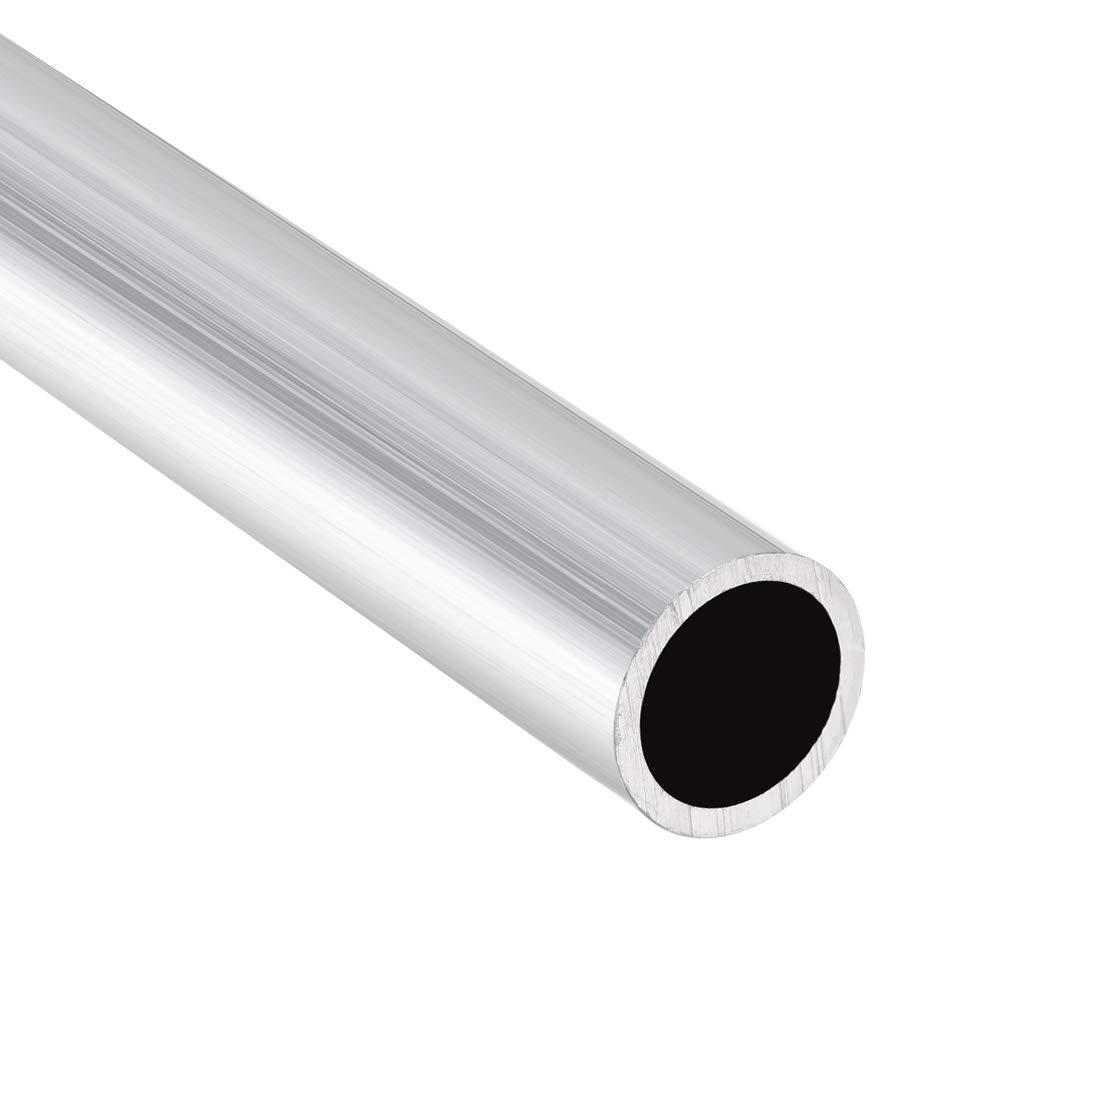 uxcell 6063 Aluminum Round Tube 300mm Length 15mm OD 13mm Inner Dia Seamless Aluminum Straight Tubing 3 Pcs